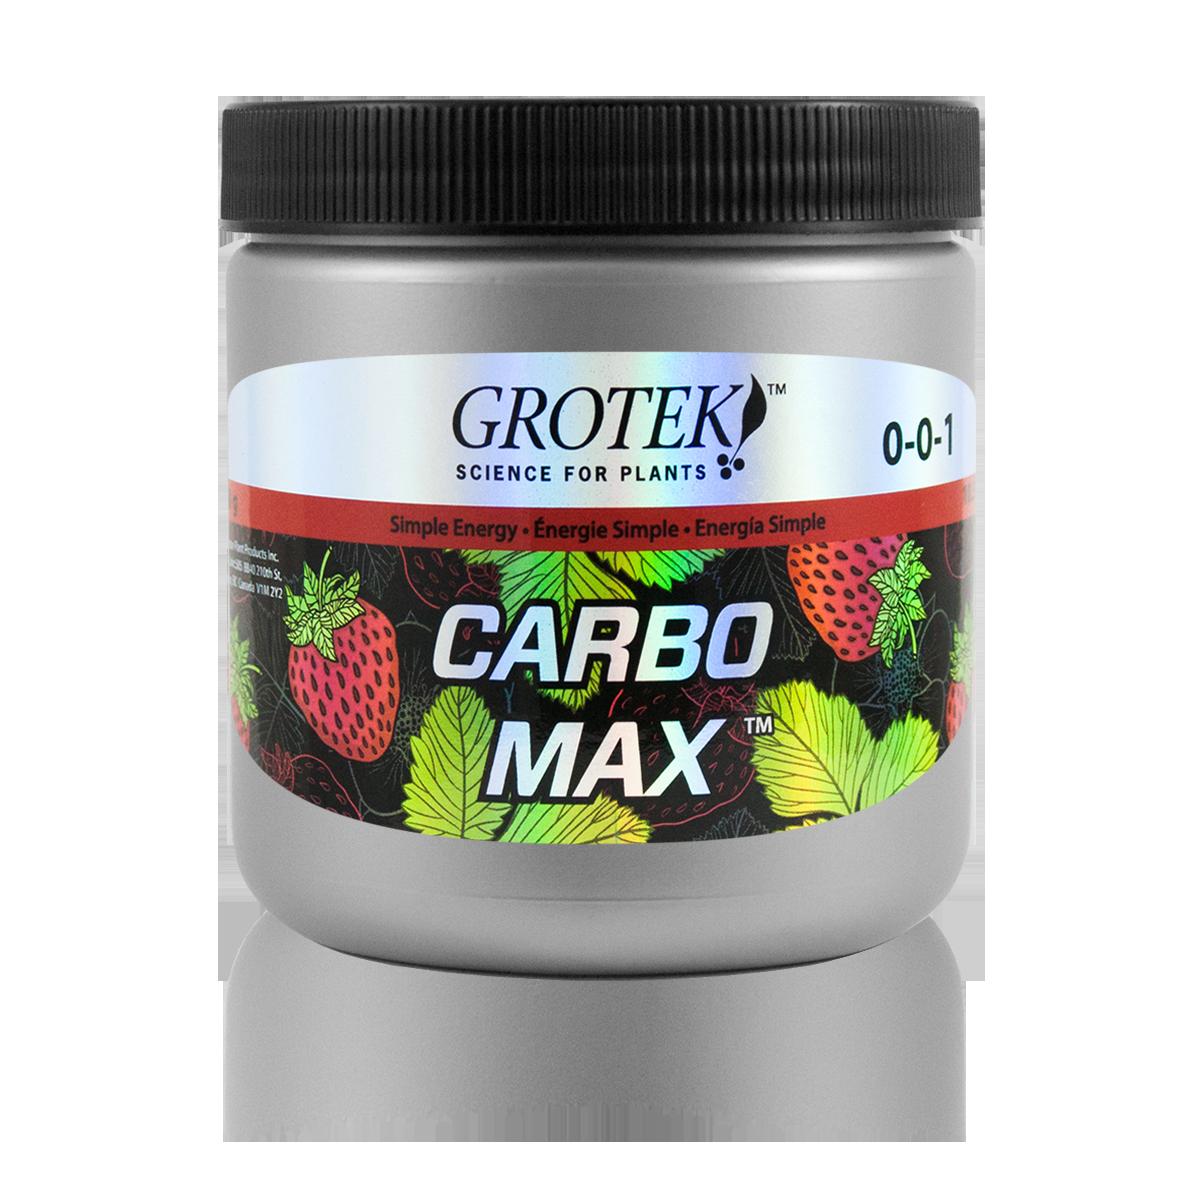 Grotek Grotek - Carbo-Max